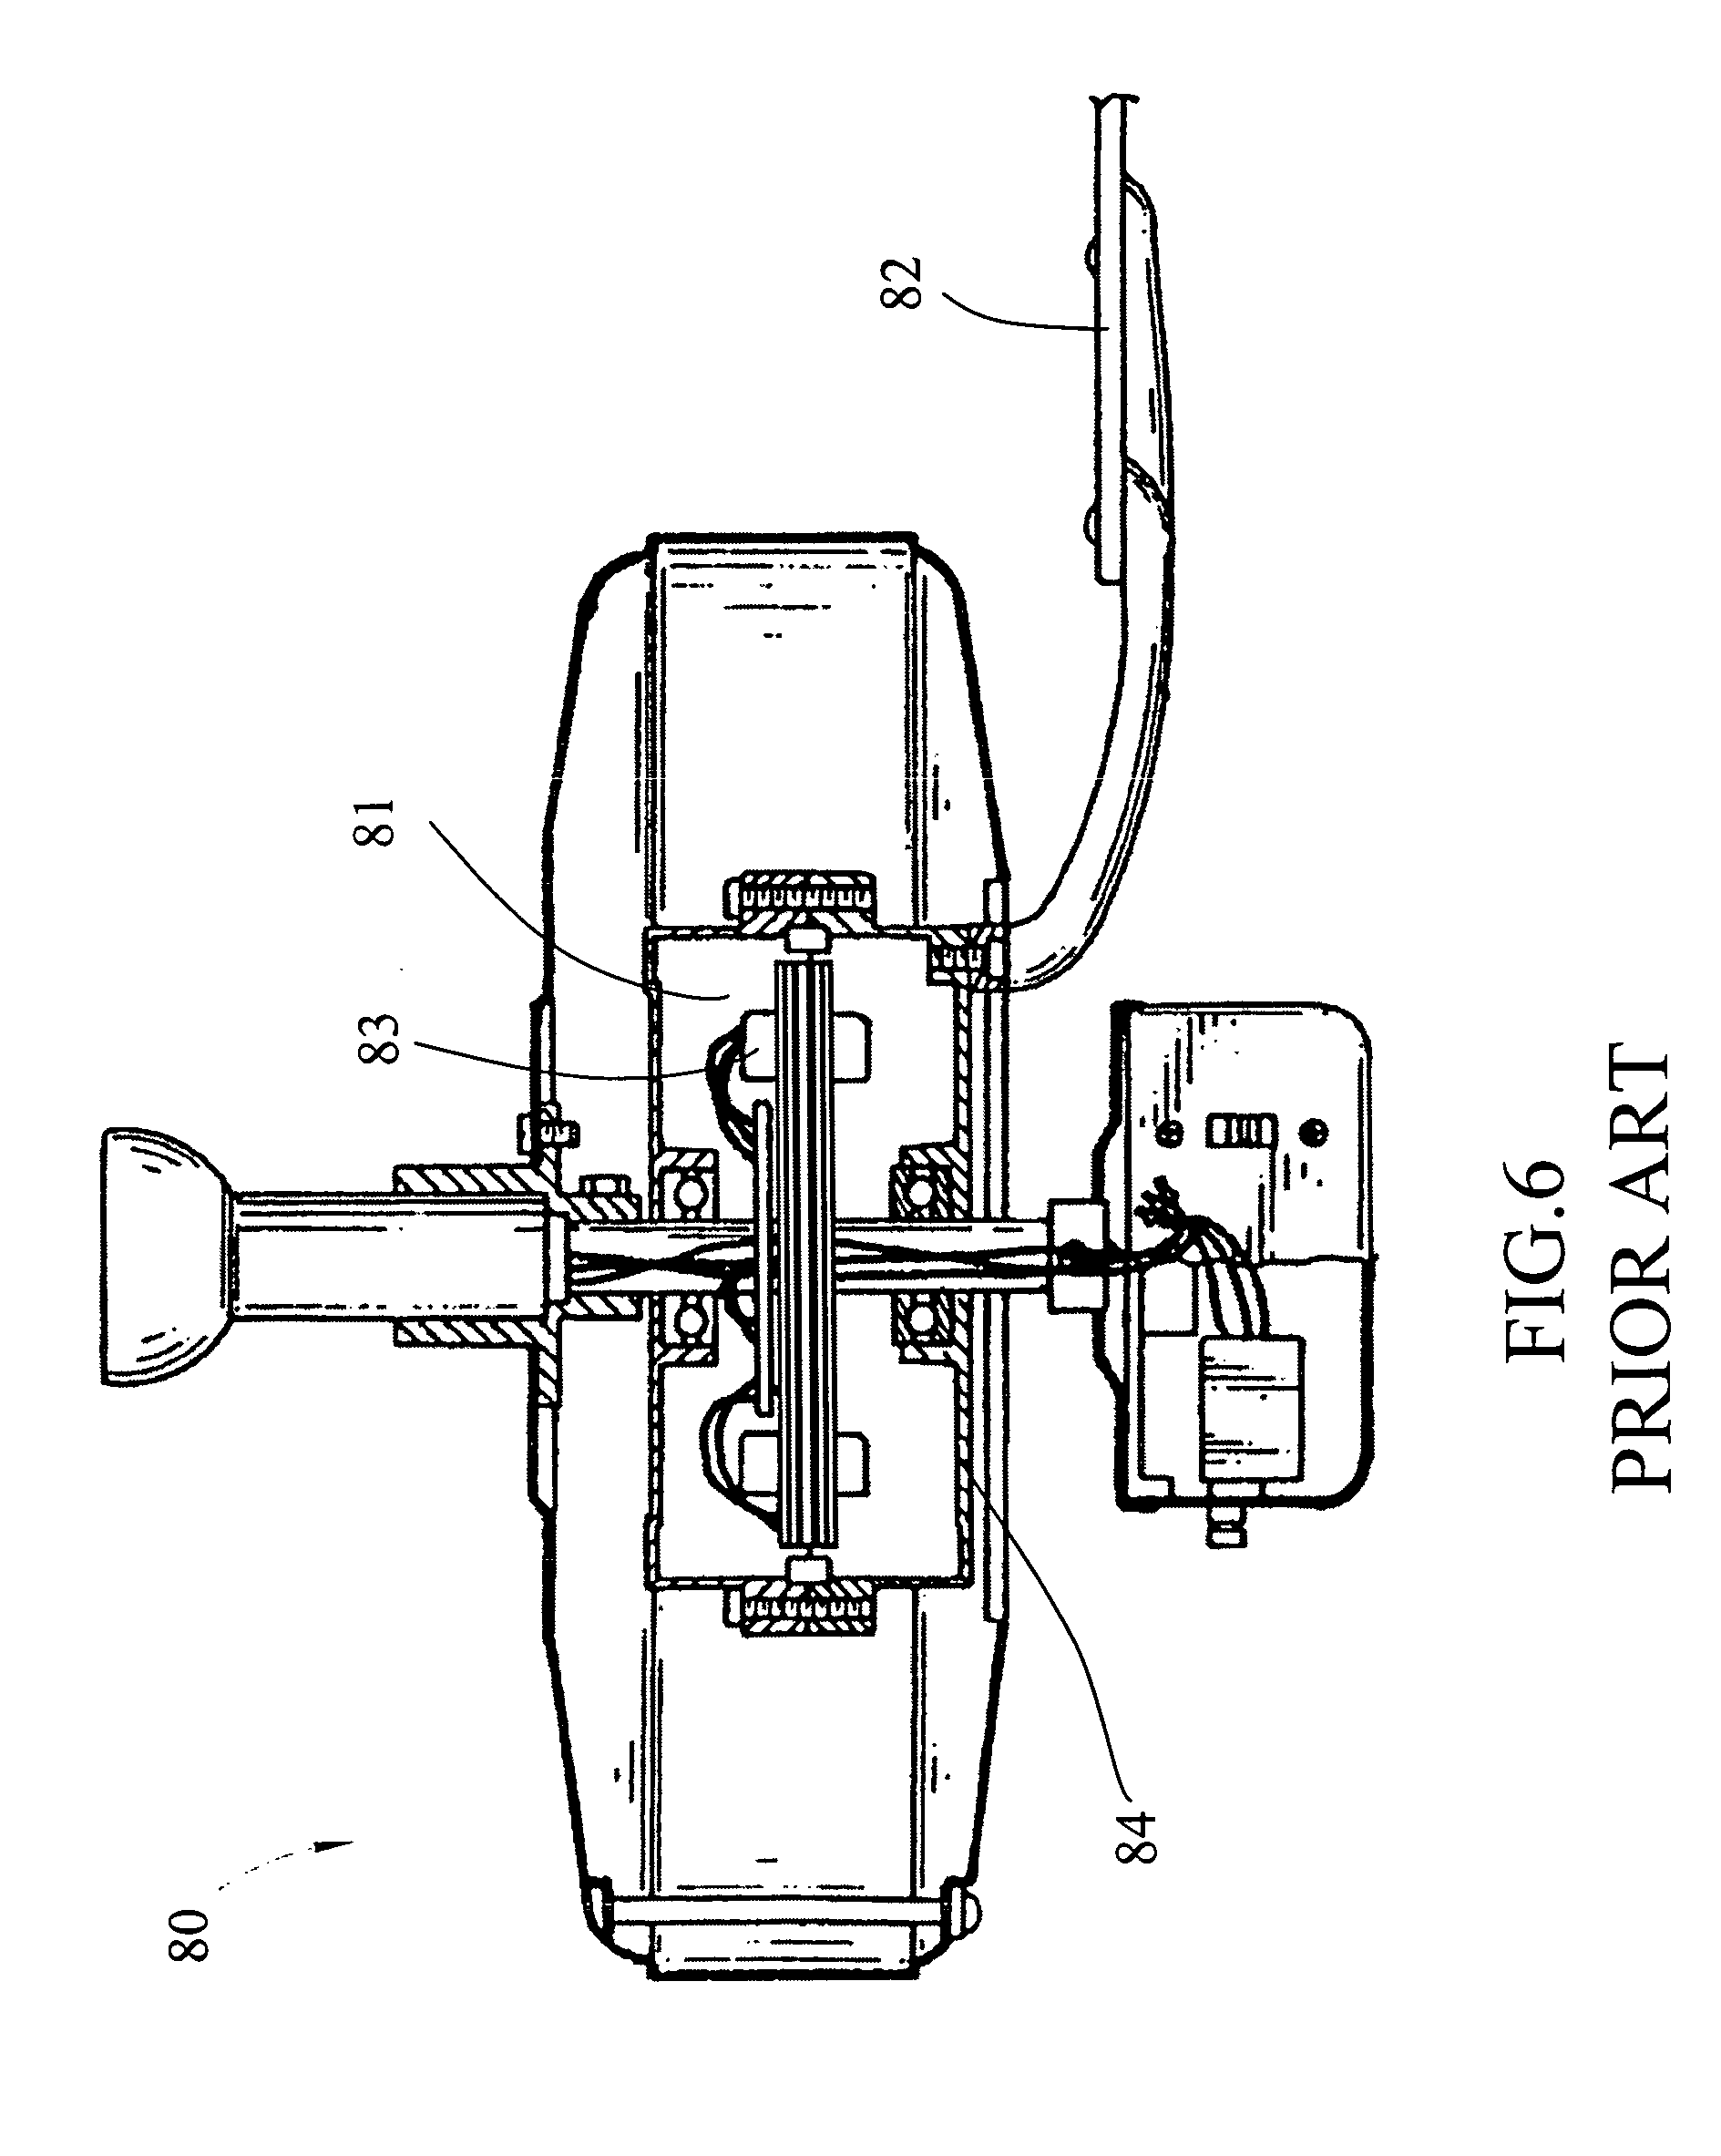 Flex A Lite Controller Wiring Diagram : 37 Wiring Diagram